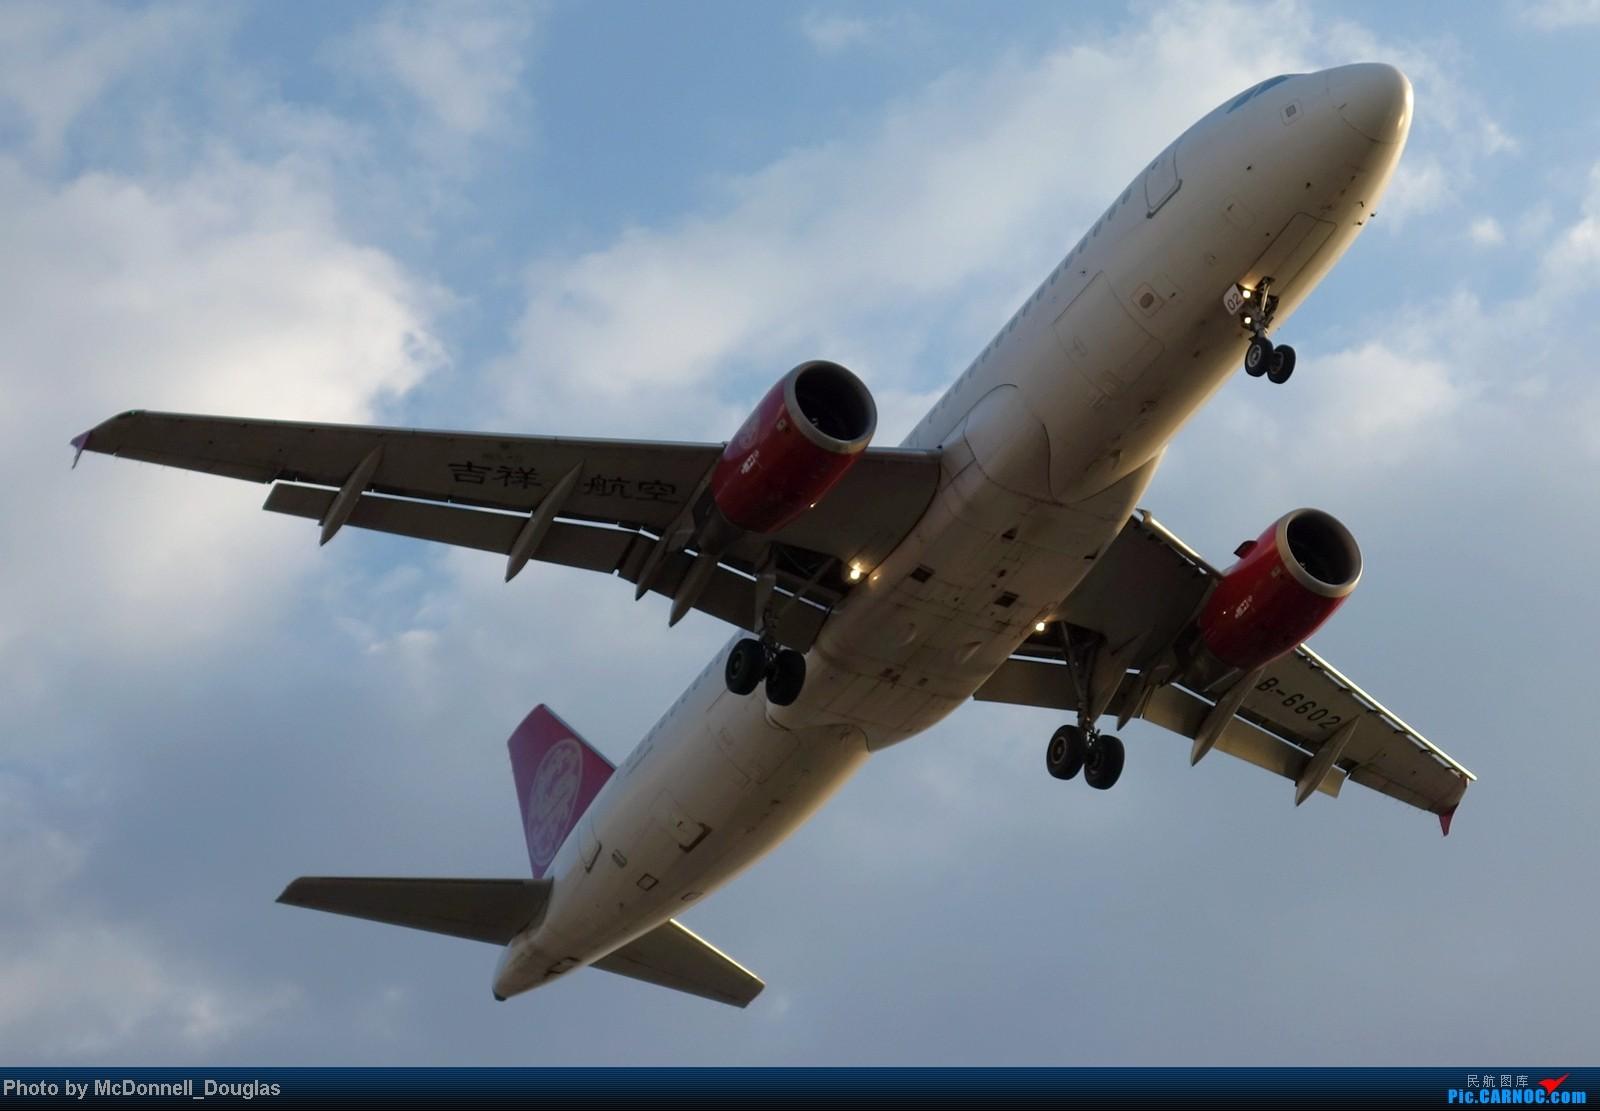 Re:[原创]【上海飞友会】ZSSS杂图一组 AIRBUS A320-200 B-6602 中国上海虹桥机场